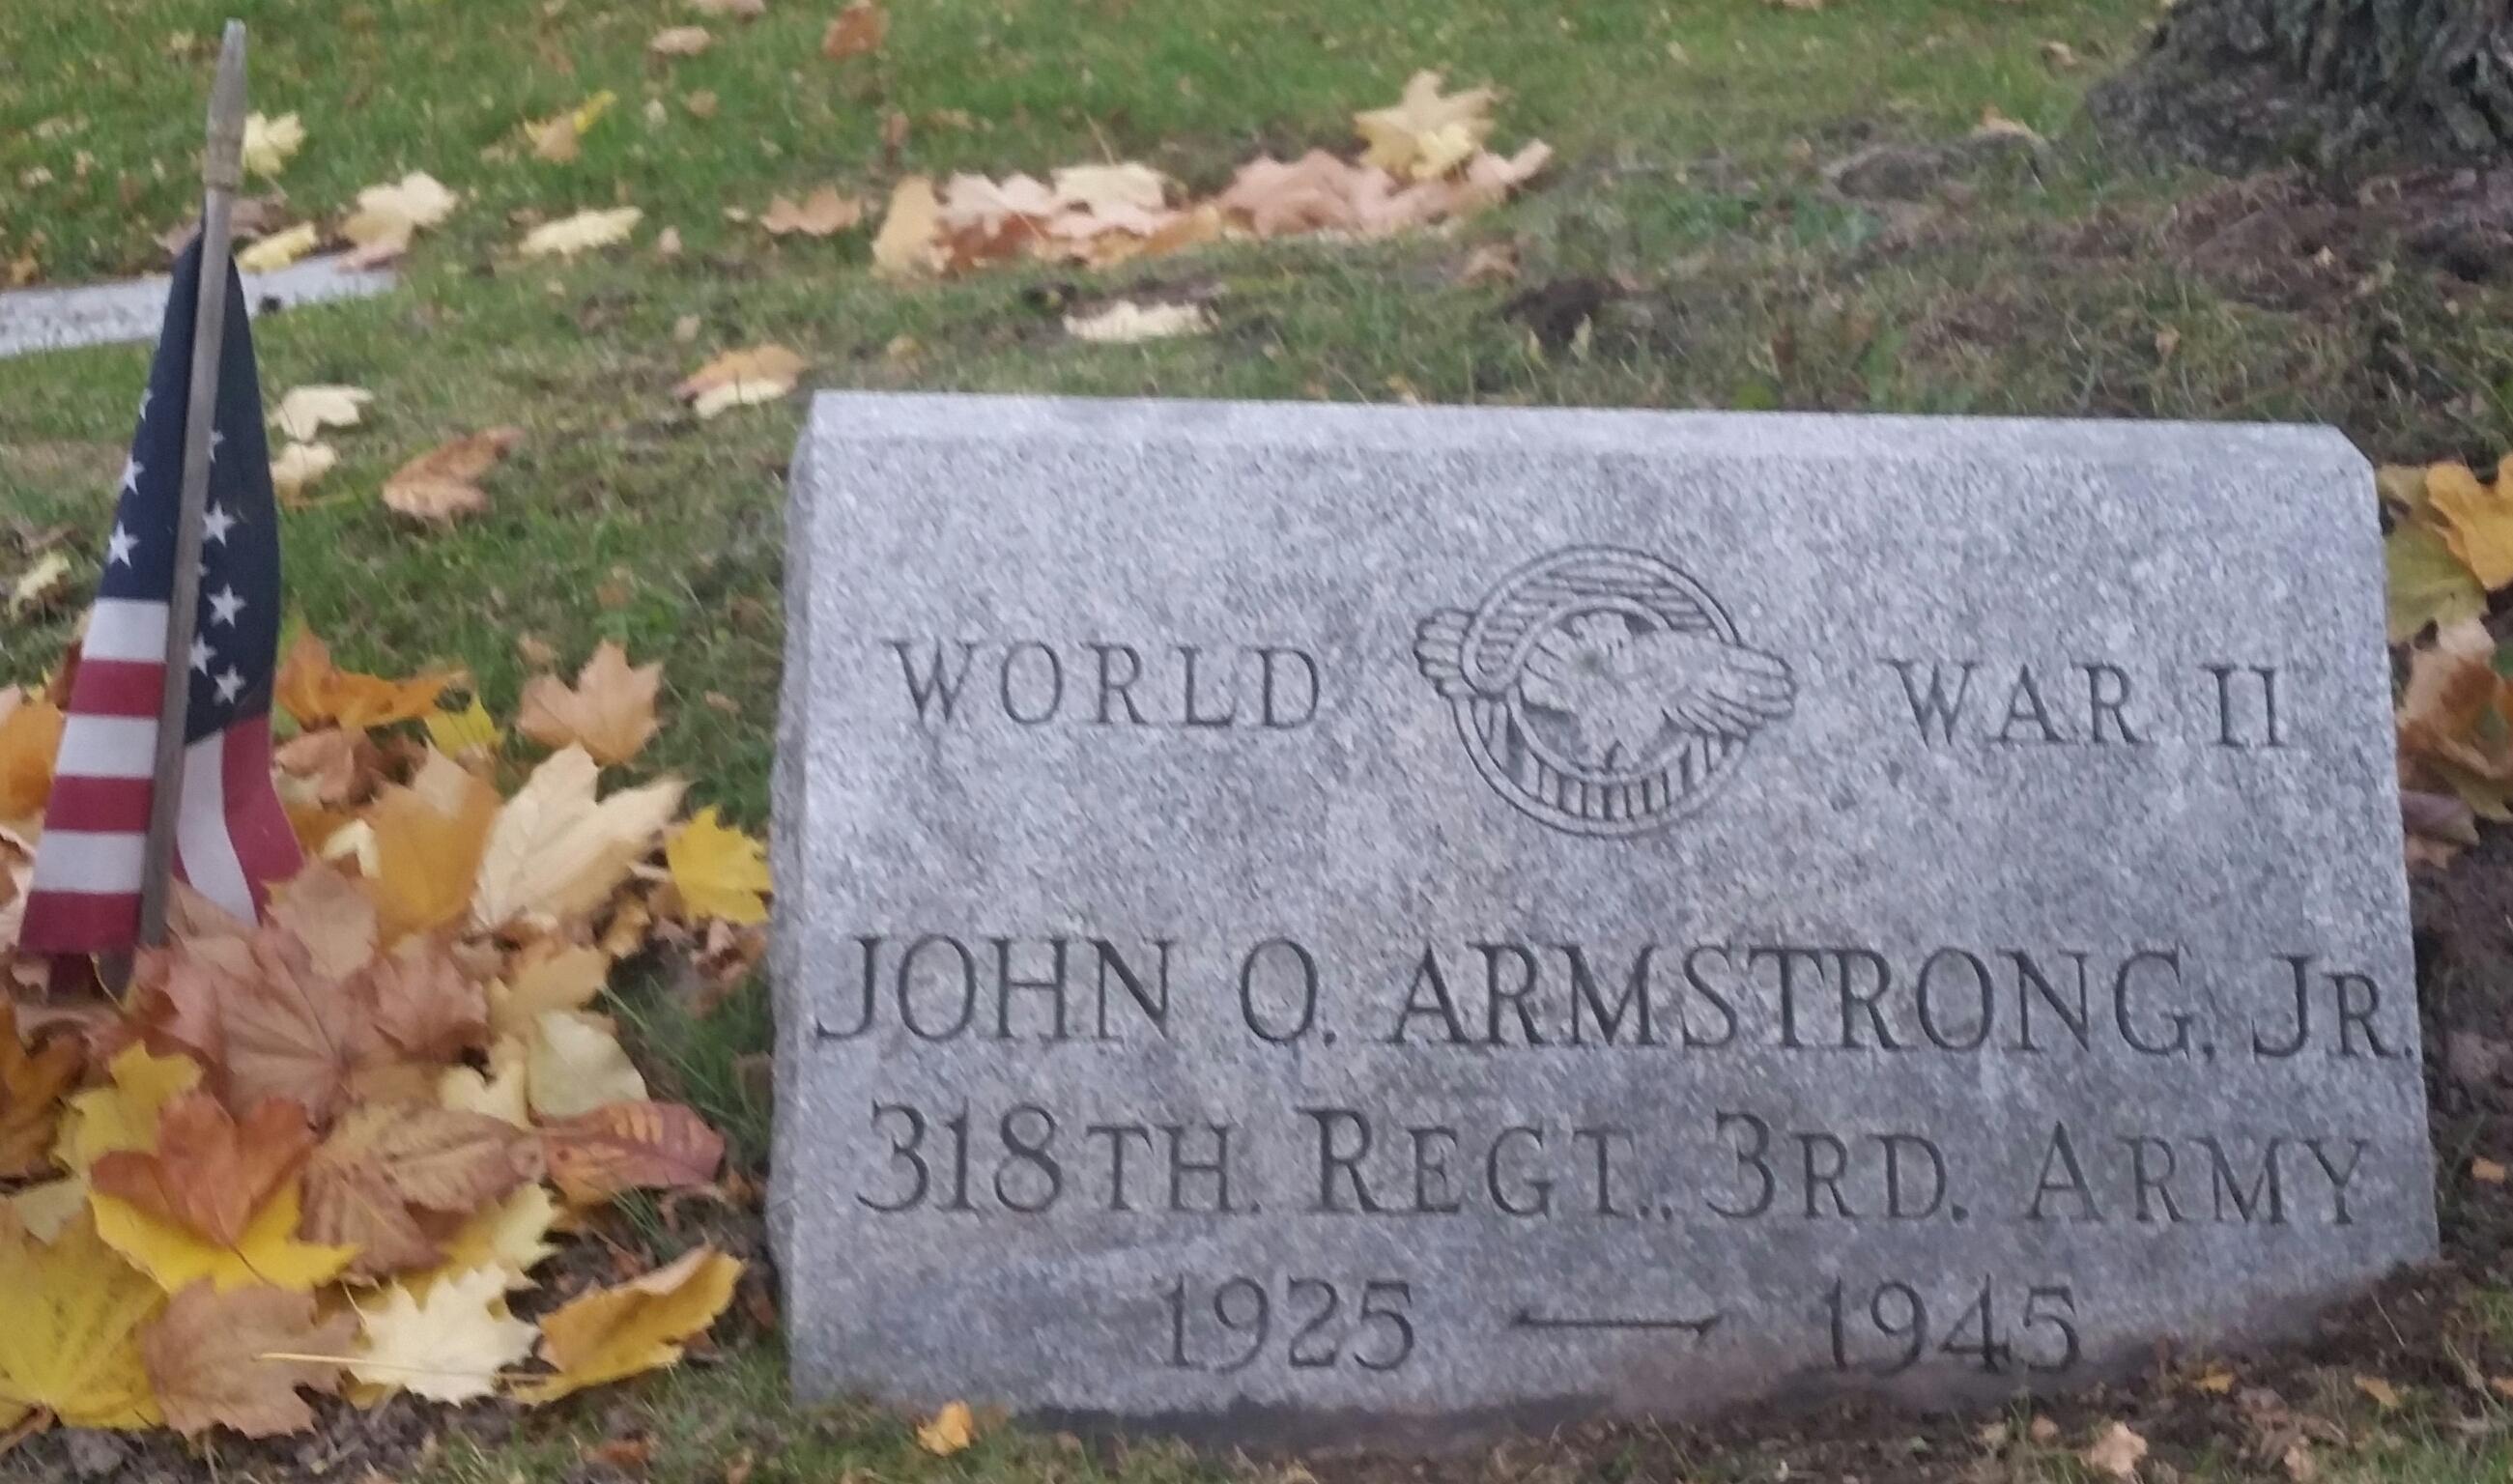 Pvt John O Armstrong, Jr